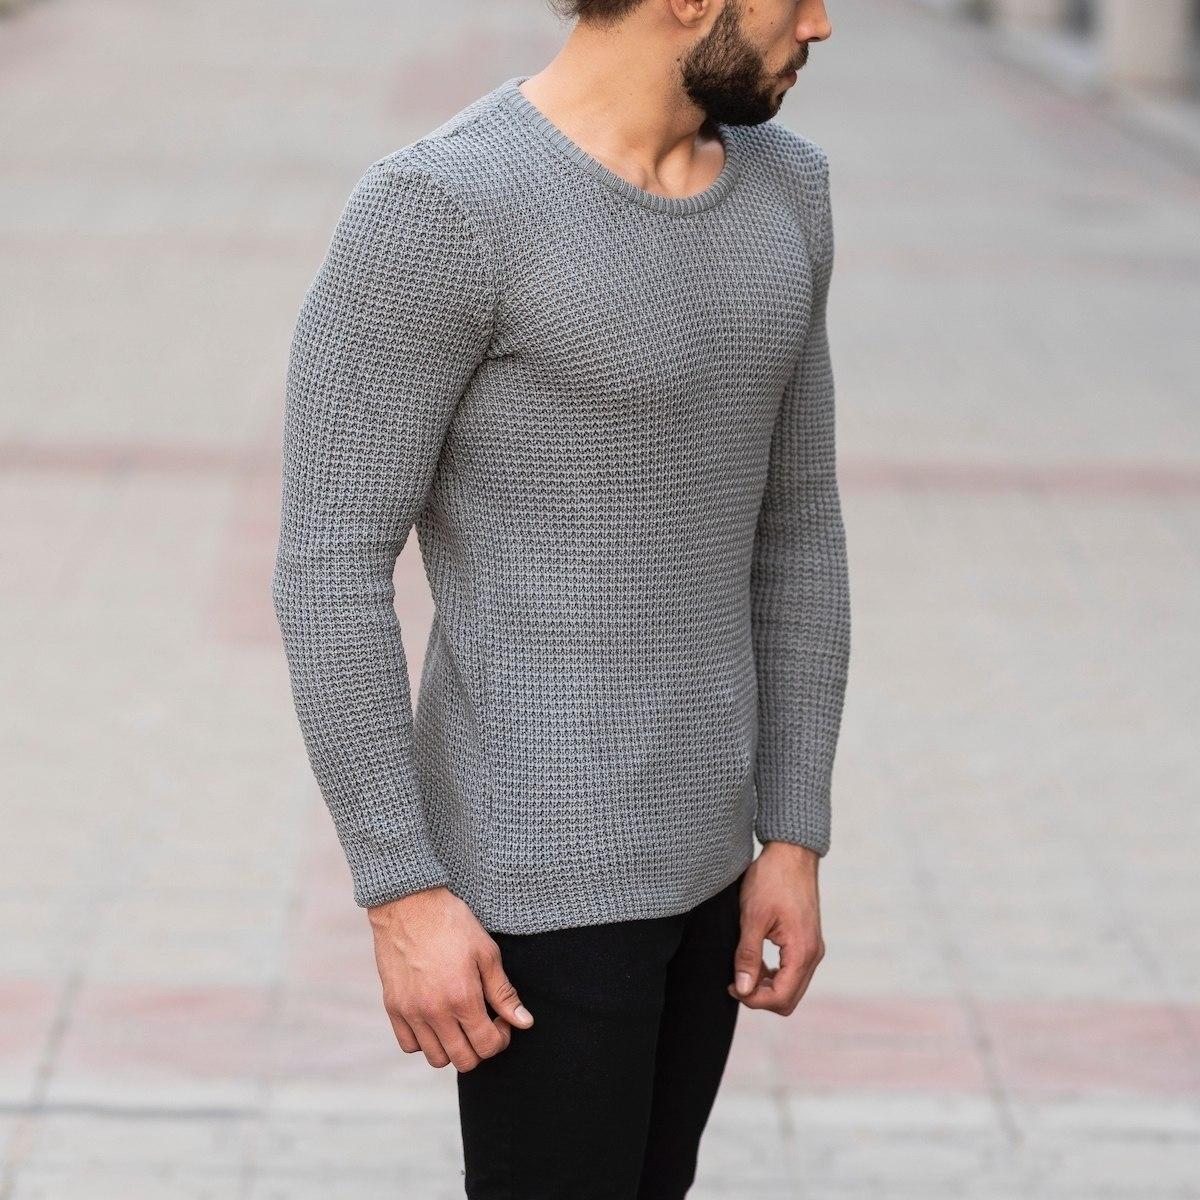 Knitted Pullover In Gray Mv Premium Brand - 2